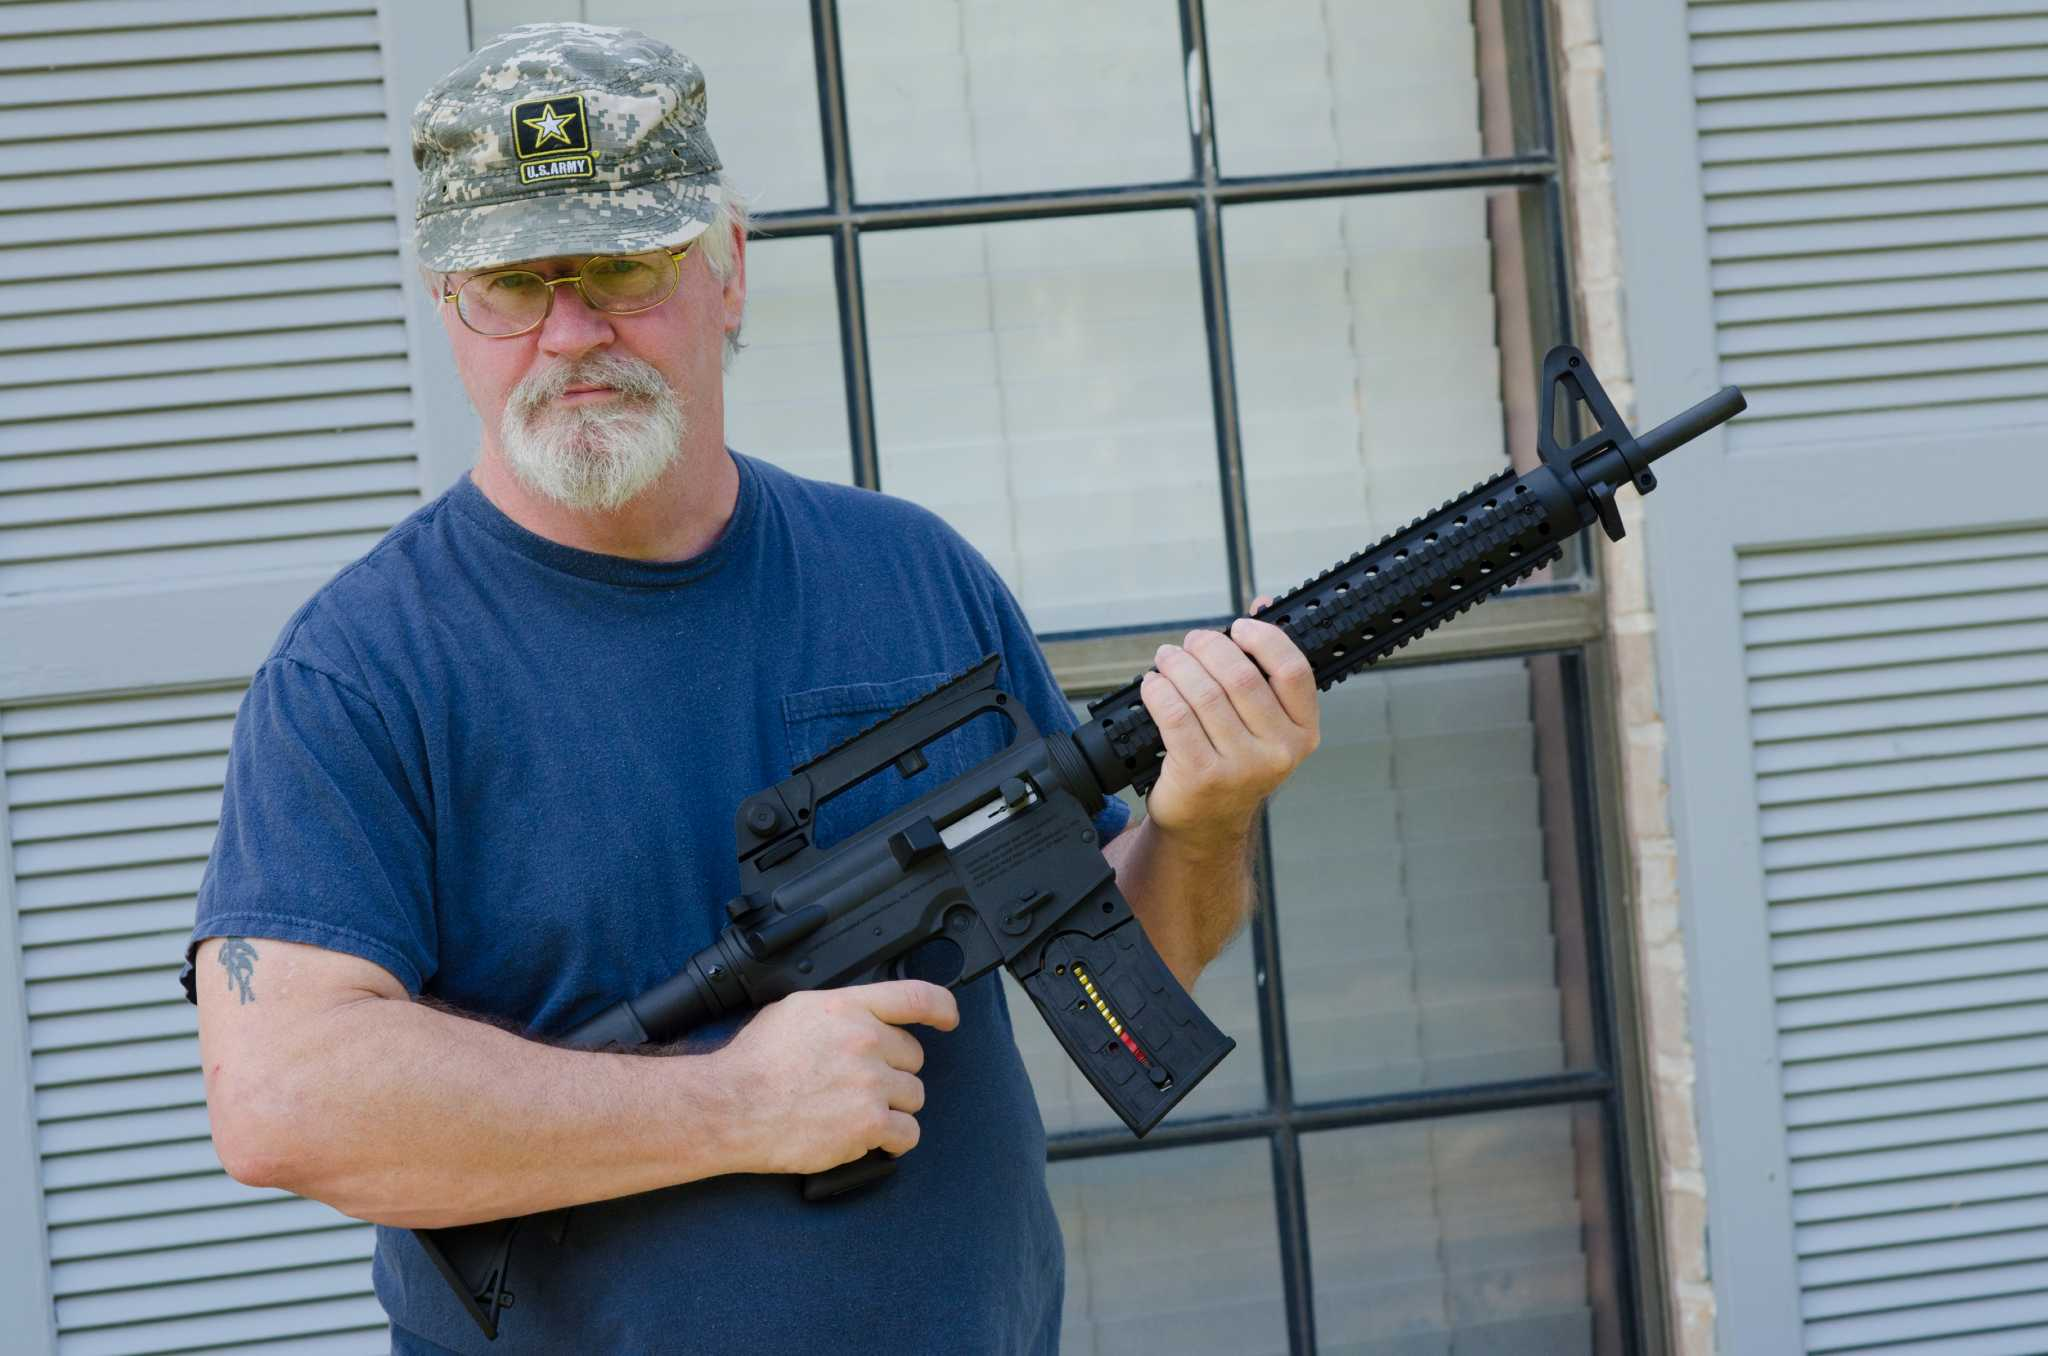 College essay buy handguns - mfawriting61.web.fc2.com